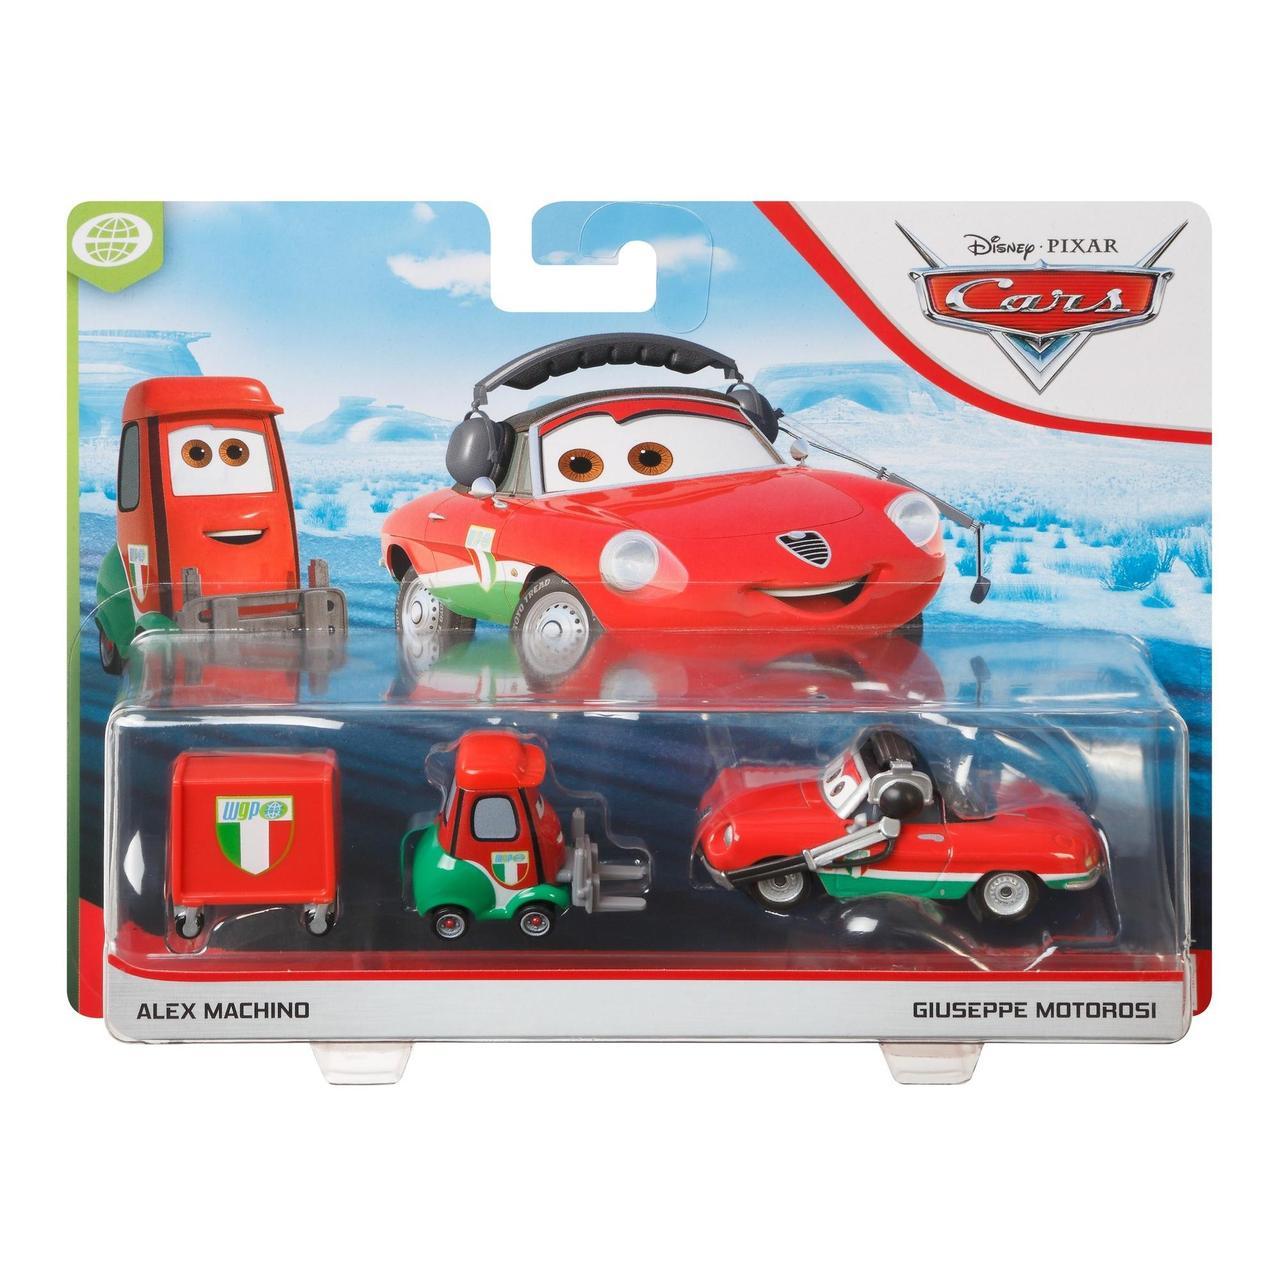 Тачки: Джузеппе Мотороси и Алекс Мачино (Disney Cars Giuseppe Motorosi and Alex Machino) от Mattel